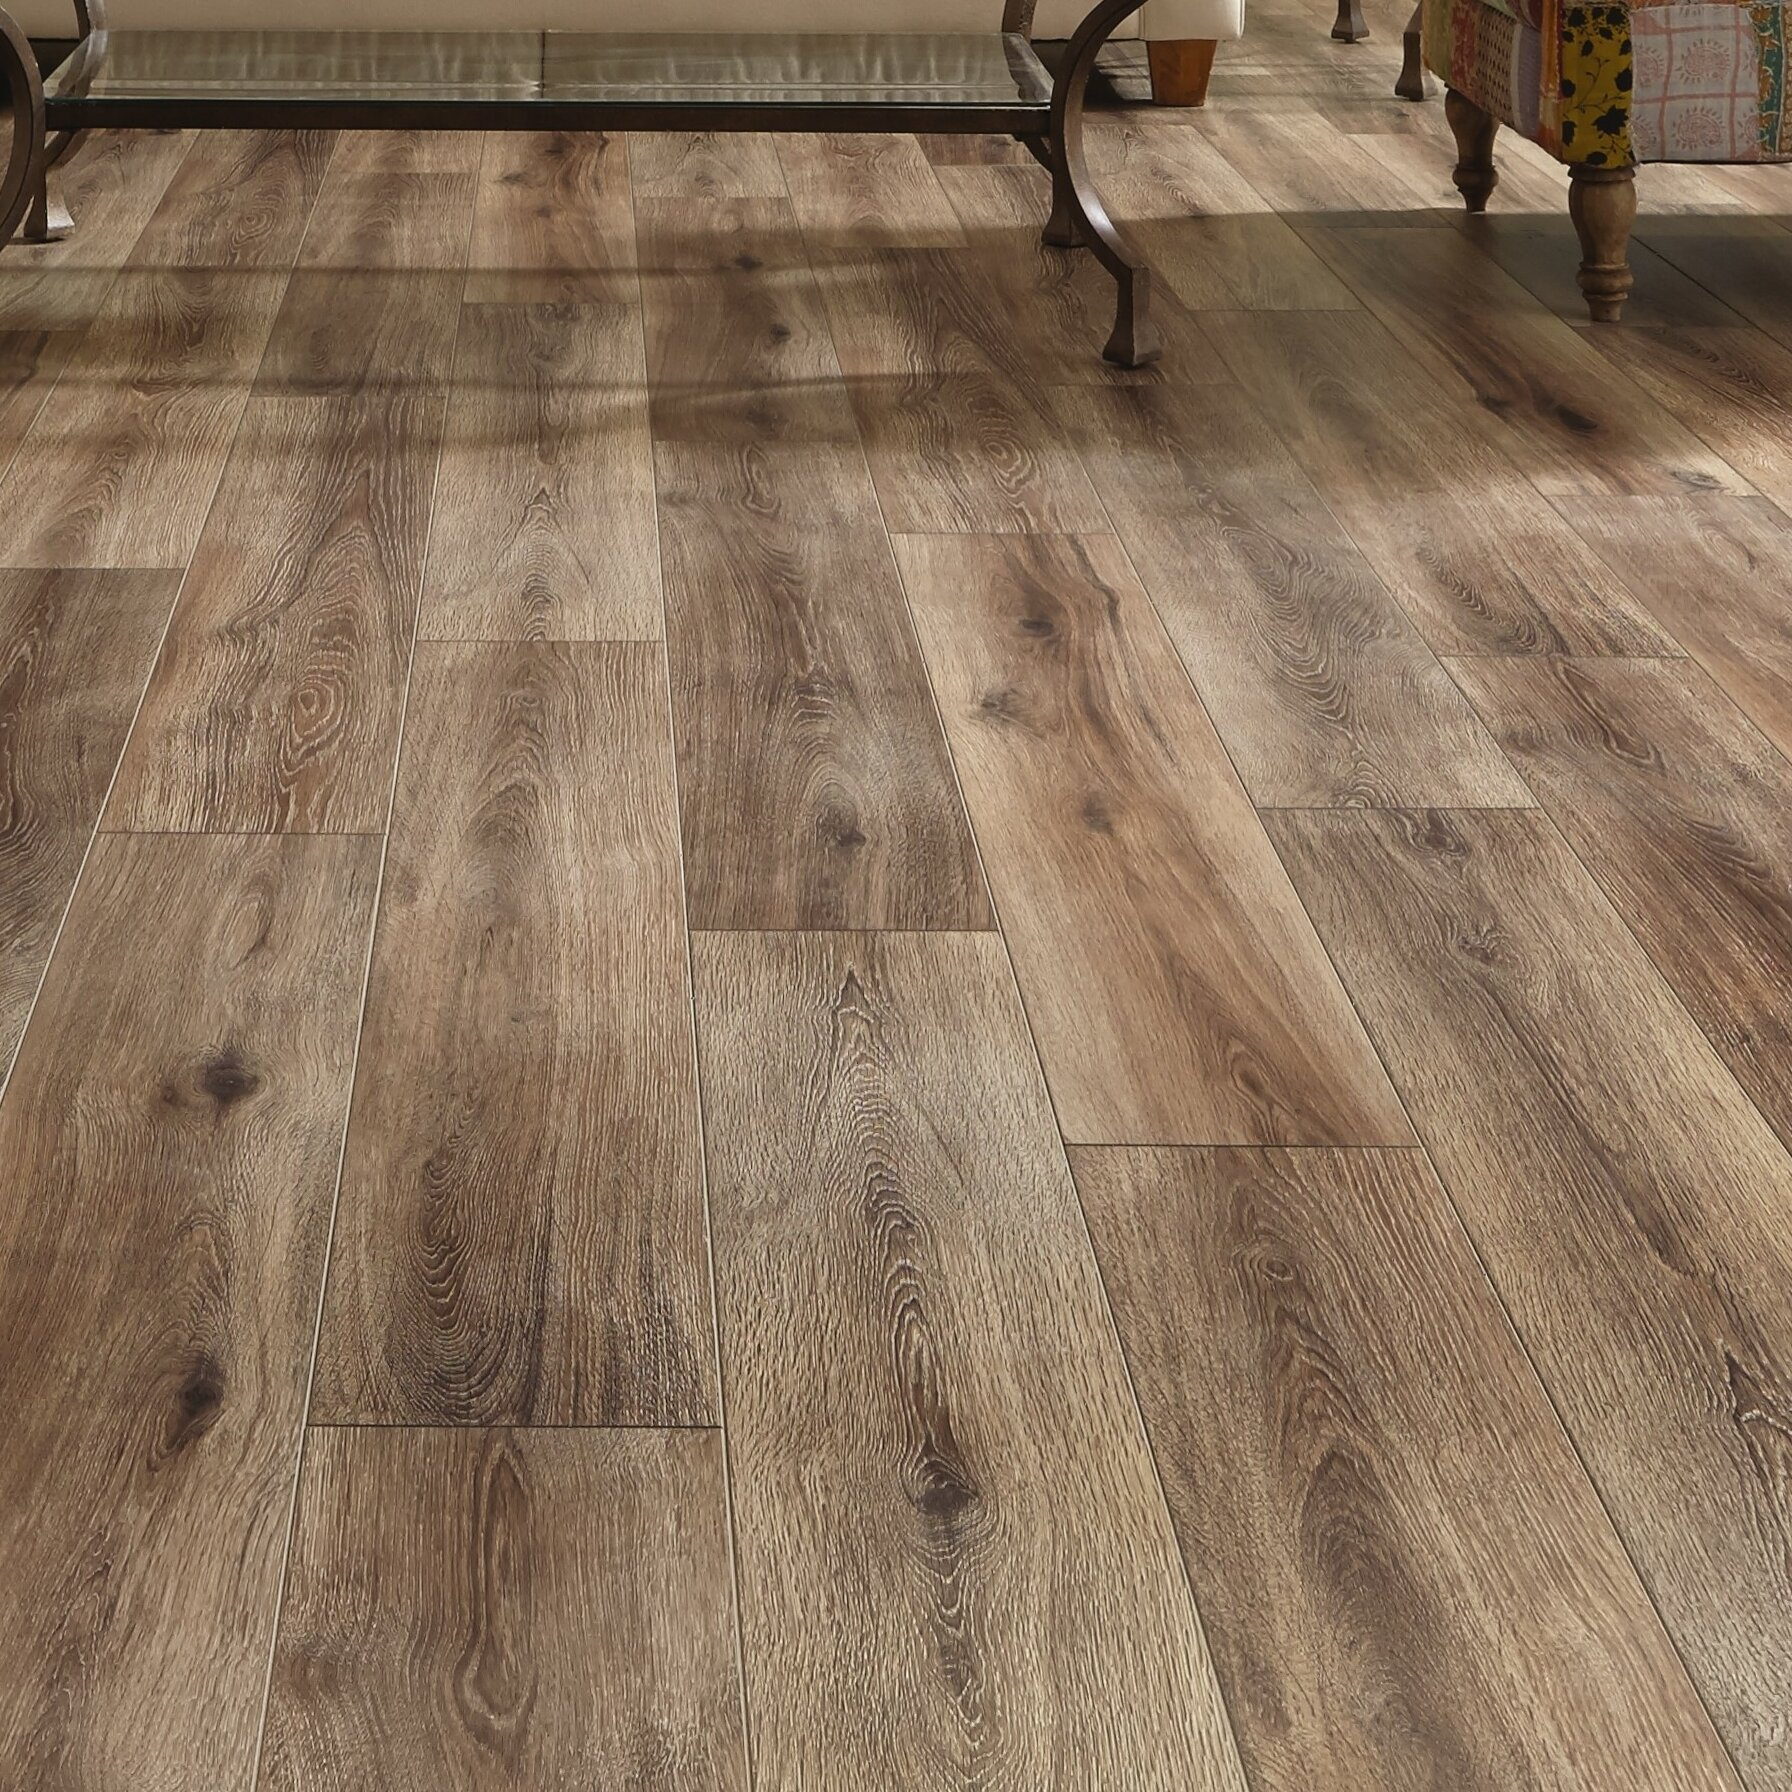 wood laminate flooring. Mannington Restoration Wide Plank 8\u0027\u0027 X 51\u0027\u0027 12mm Laminate Flooring In Brushed Coffee   Wayfair Wood